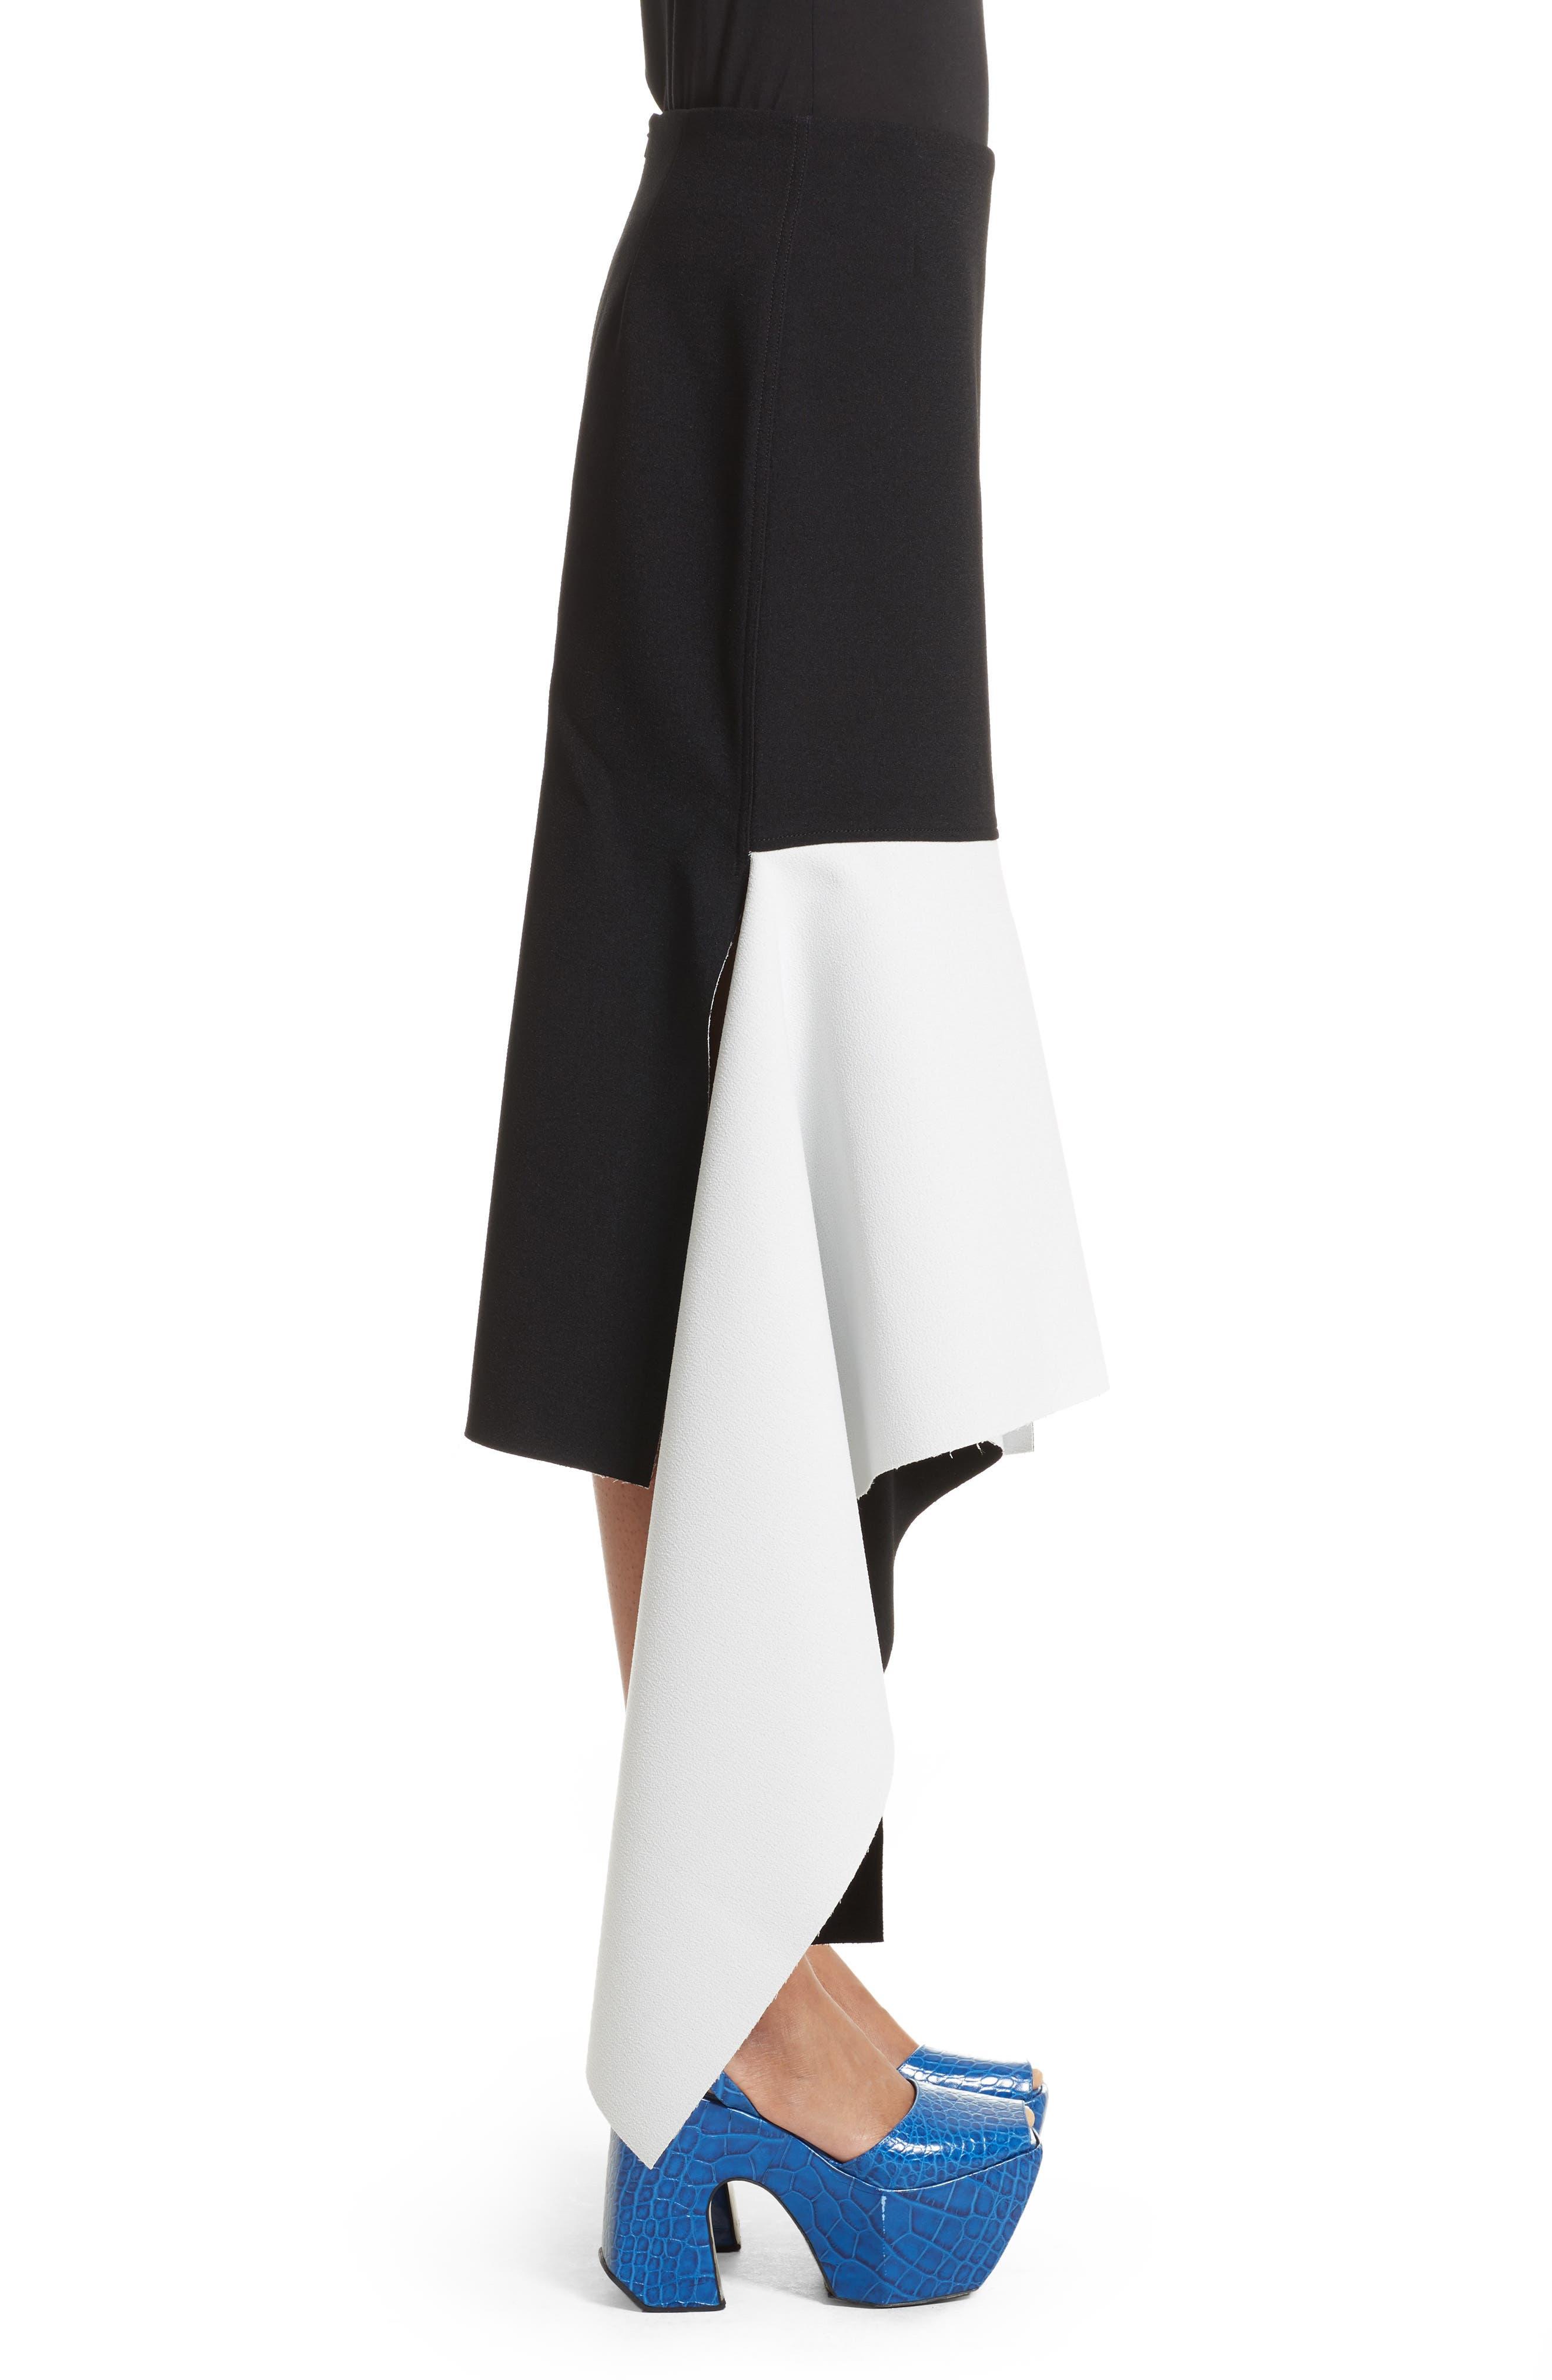 Marques'Almeida Asymmetrical Bicolor Crepe Skirt,                             Alternate thumbnail 3, color,                             003